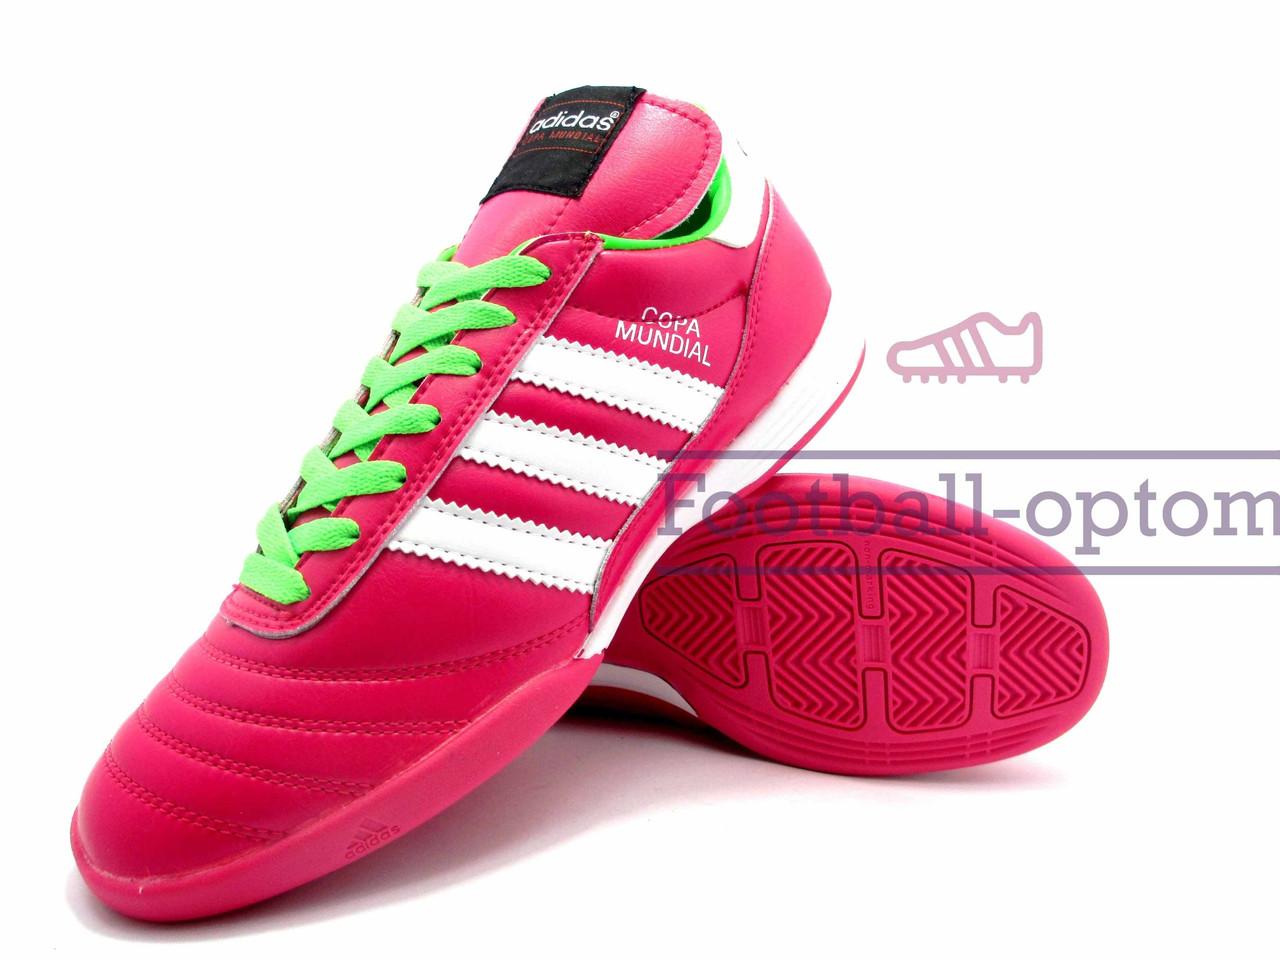 e1084673 Футзалки (бампы) Adidas Copa Mundial\Адидас Копа Мундиаль , розовые, ...